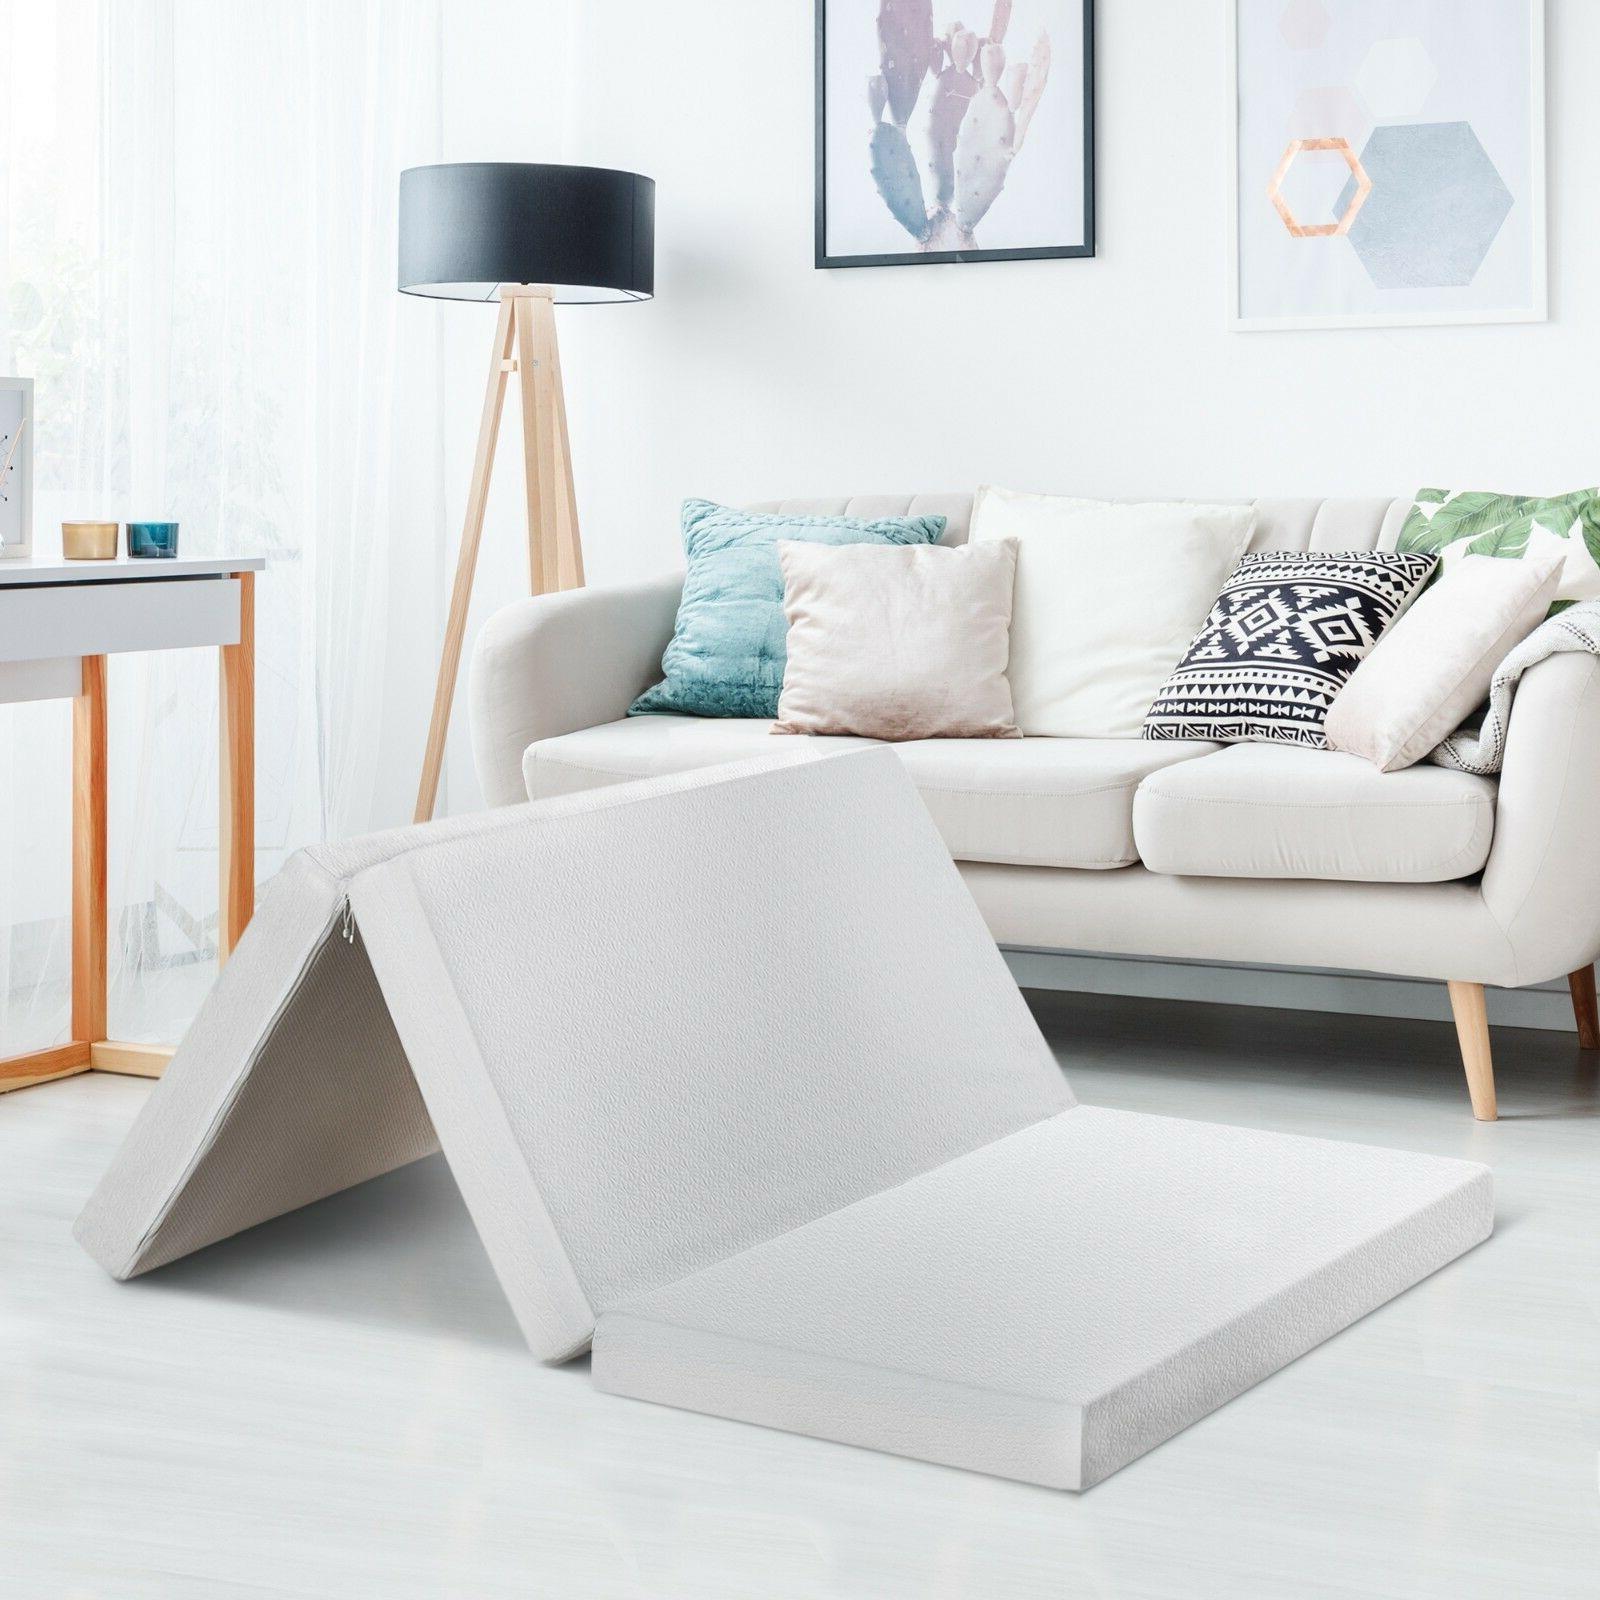 tri folding portable rv memory foam mattress